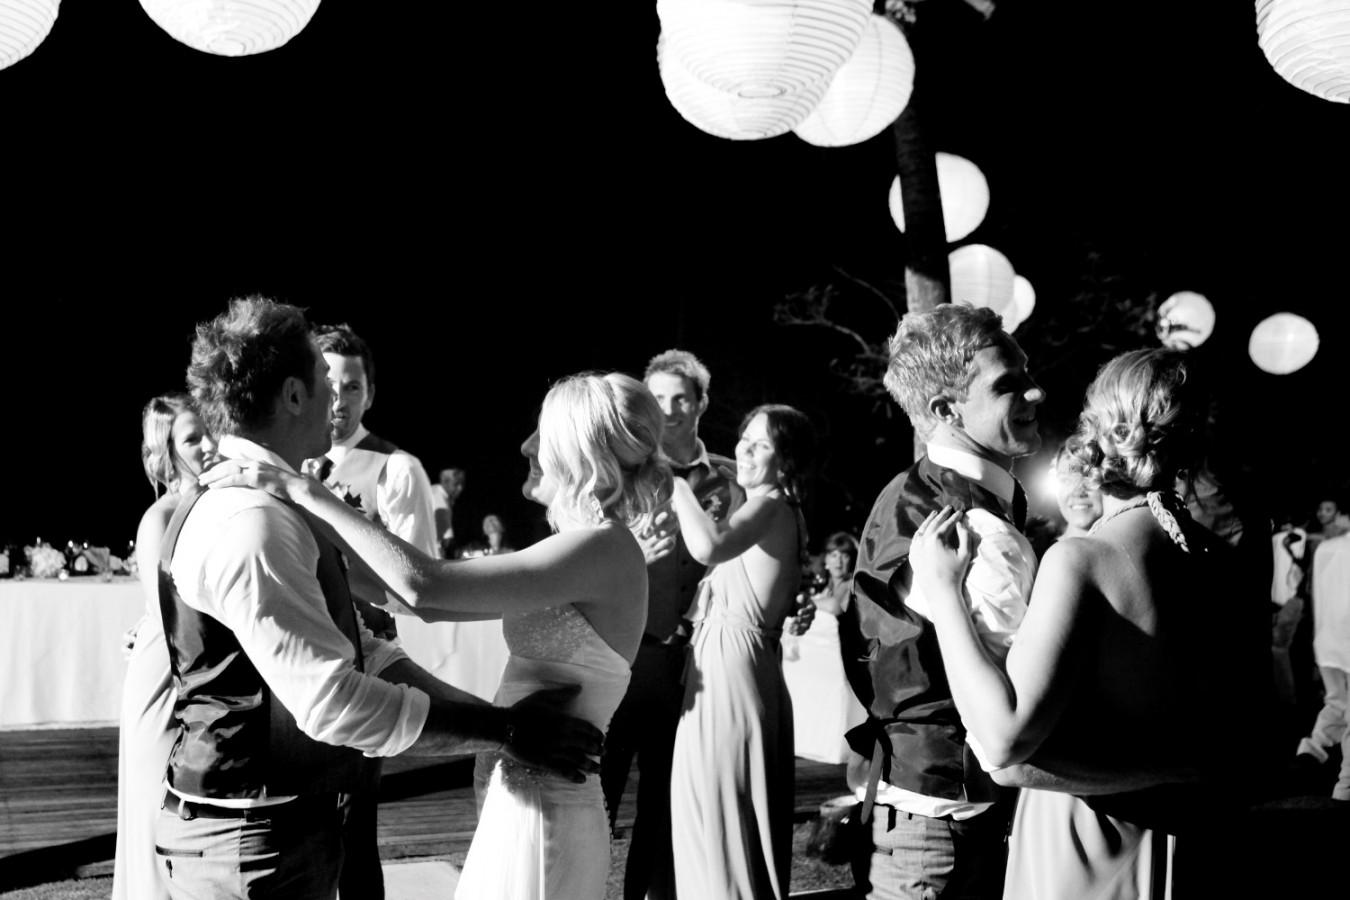 2011.10.16, Megann and Daniel, Ombak Luwung, MJY - Bali Wedding Paradise (38)